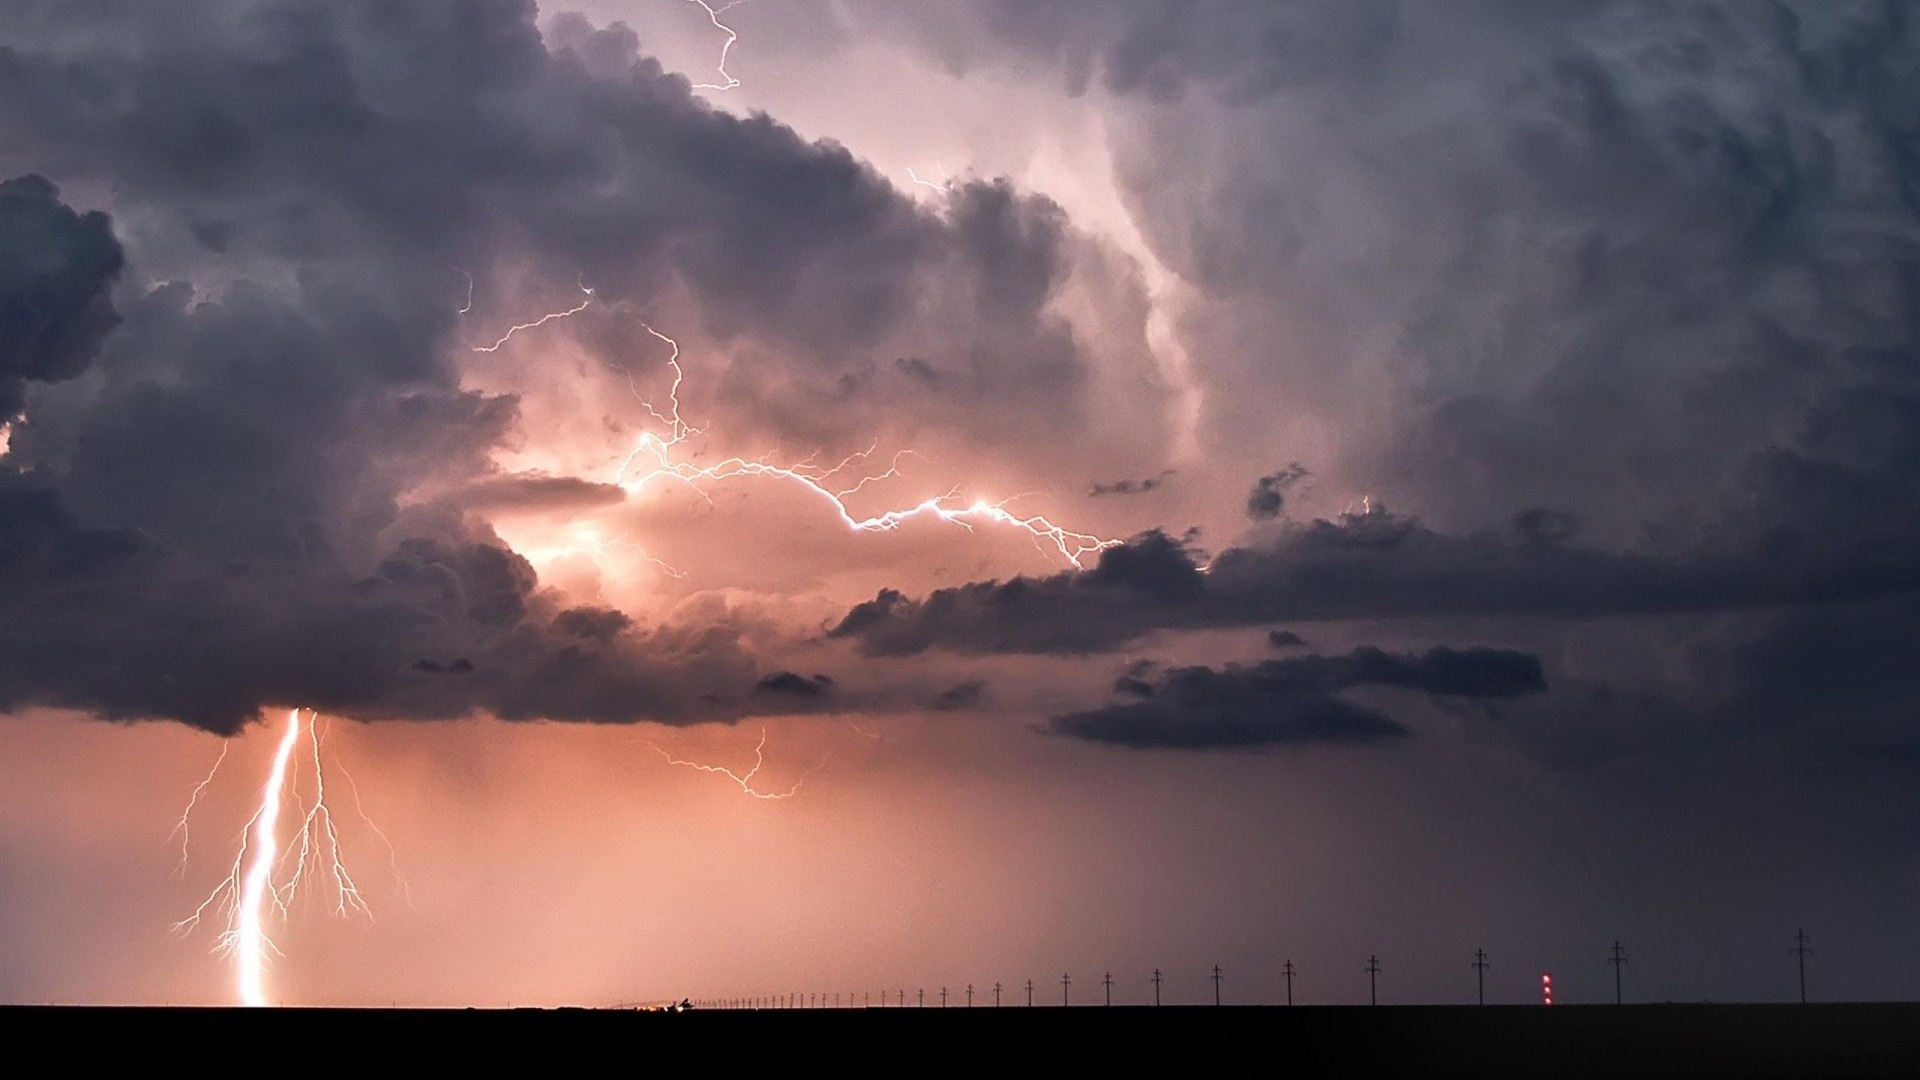 Thunderstorm Wallpaper 1920x1080px 905036 1920x1080